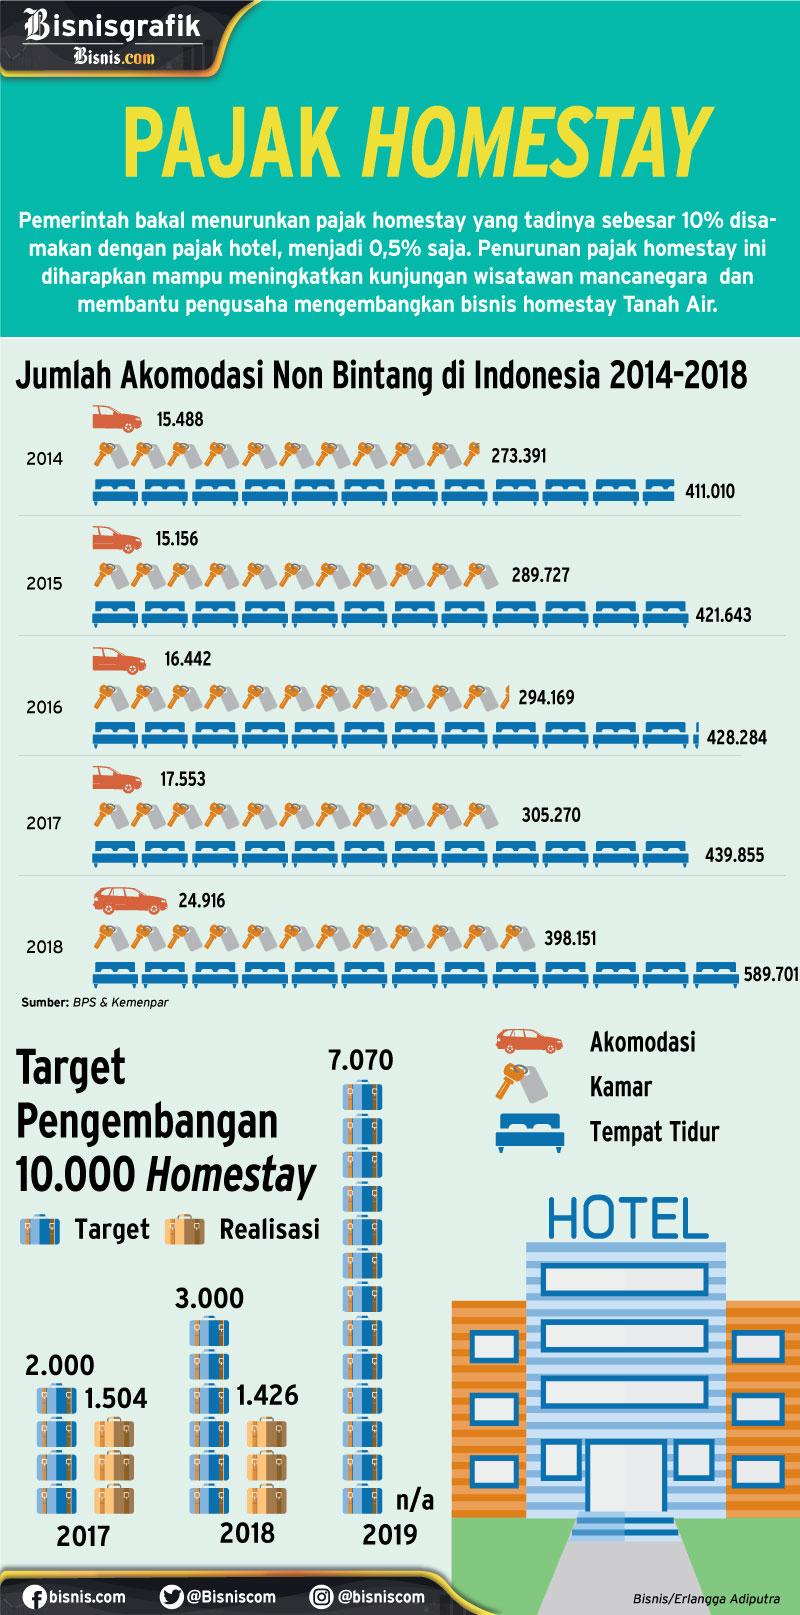 Homestay dapat keringanan pajak - Eralngga Adiputra / Ilham Nesabana